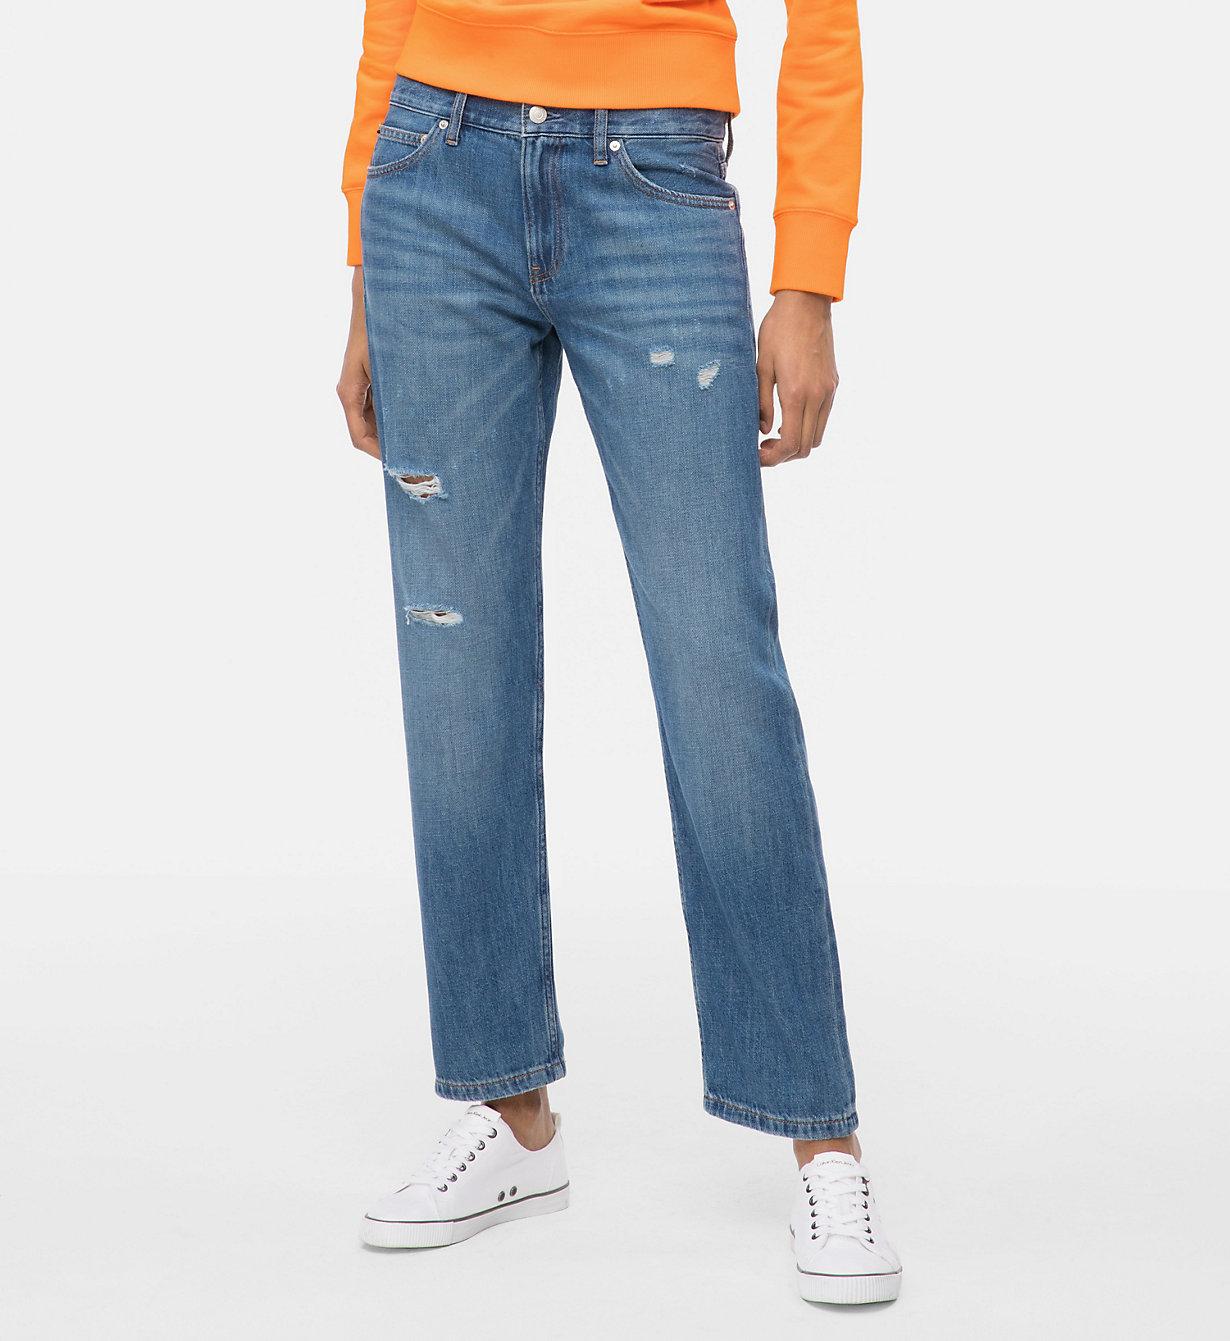 CKJ 061 Mid Rise Boy Jeans Calvin Klein LFahoE3l